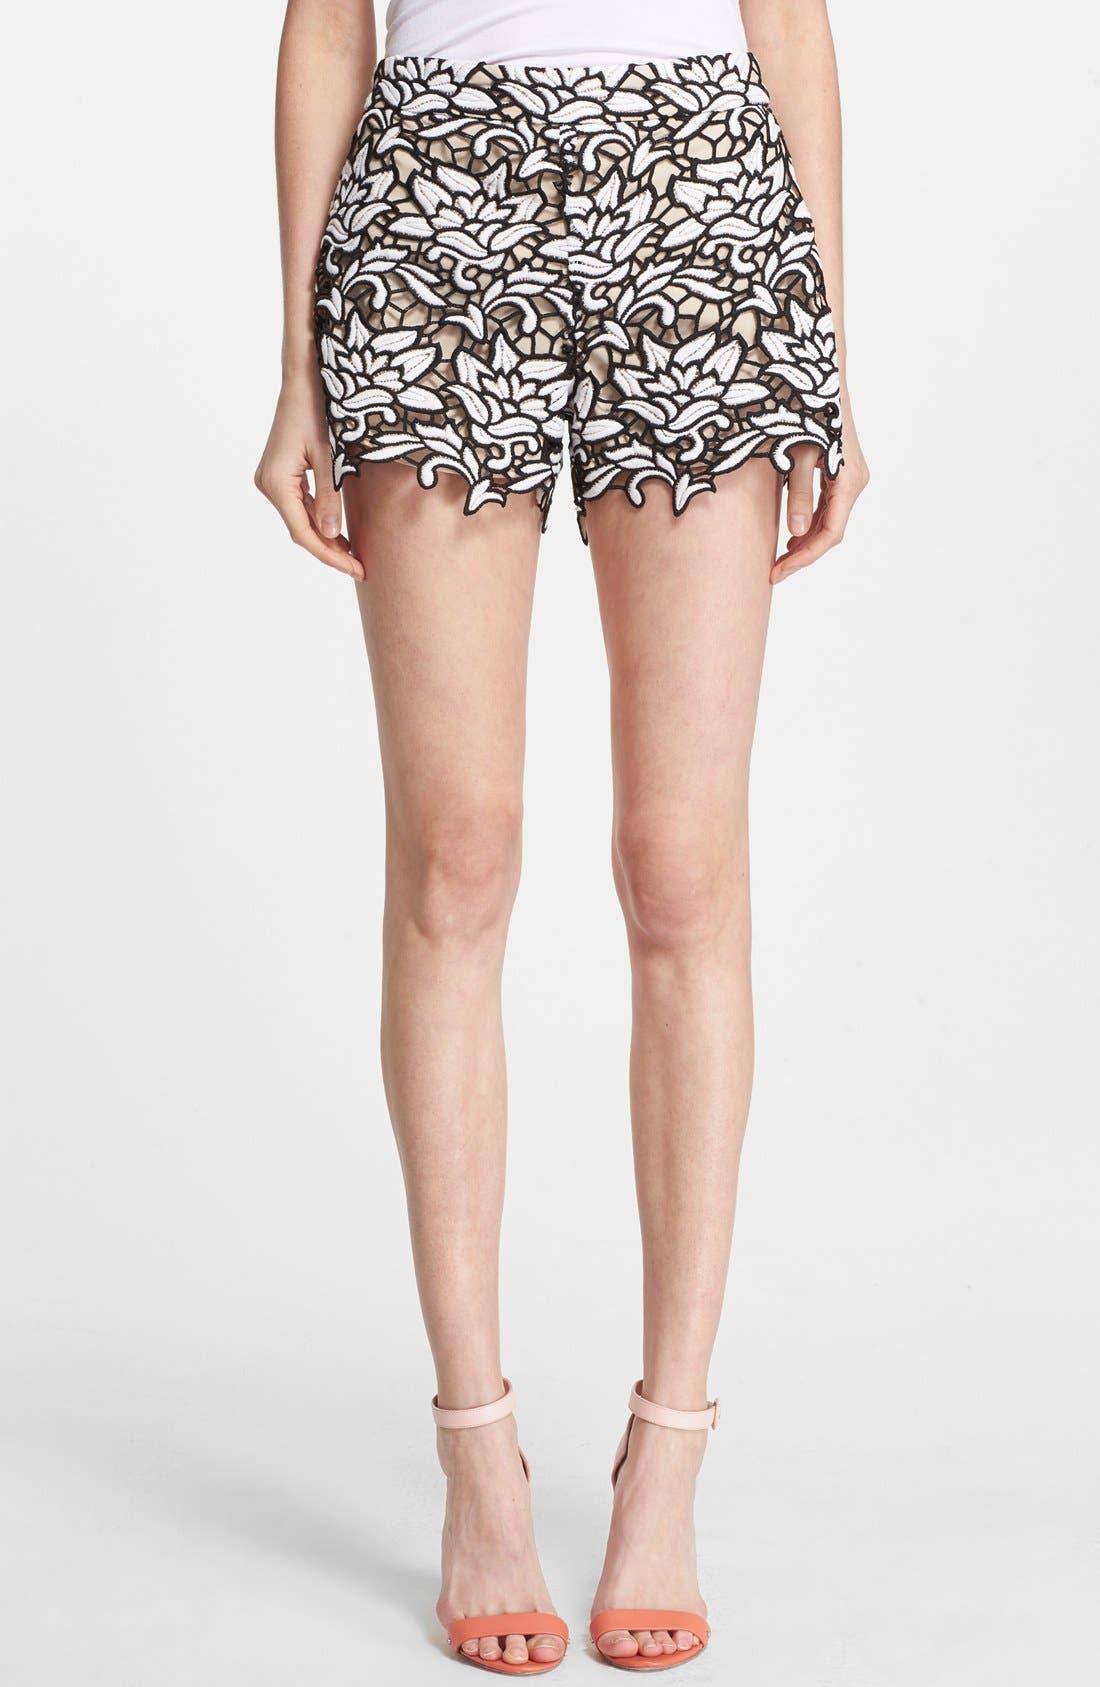 Alternate Image 1 Selected - Alice + Olivia High Waist Lace Shorts